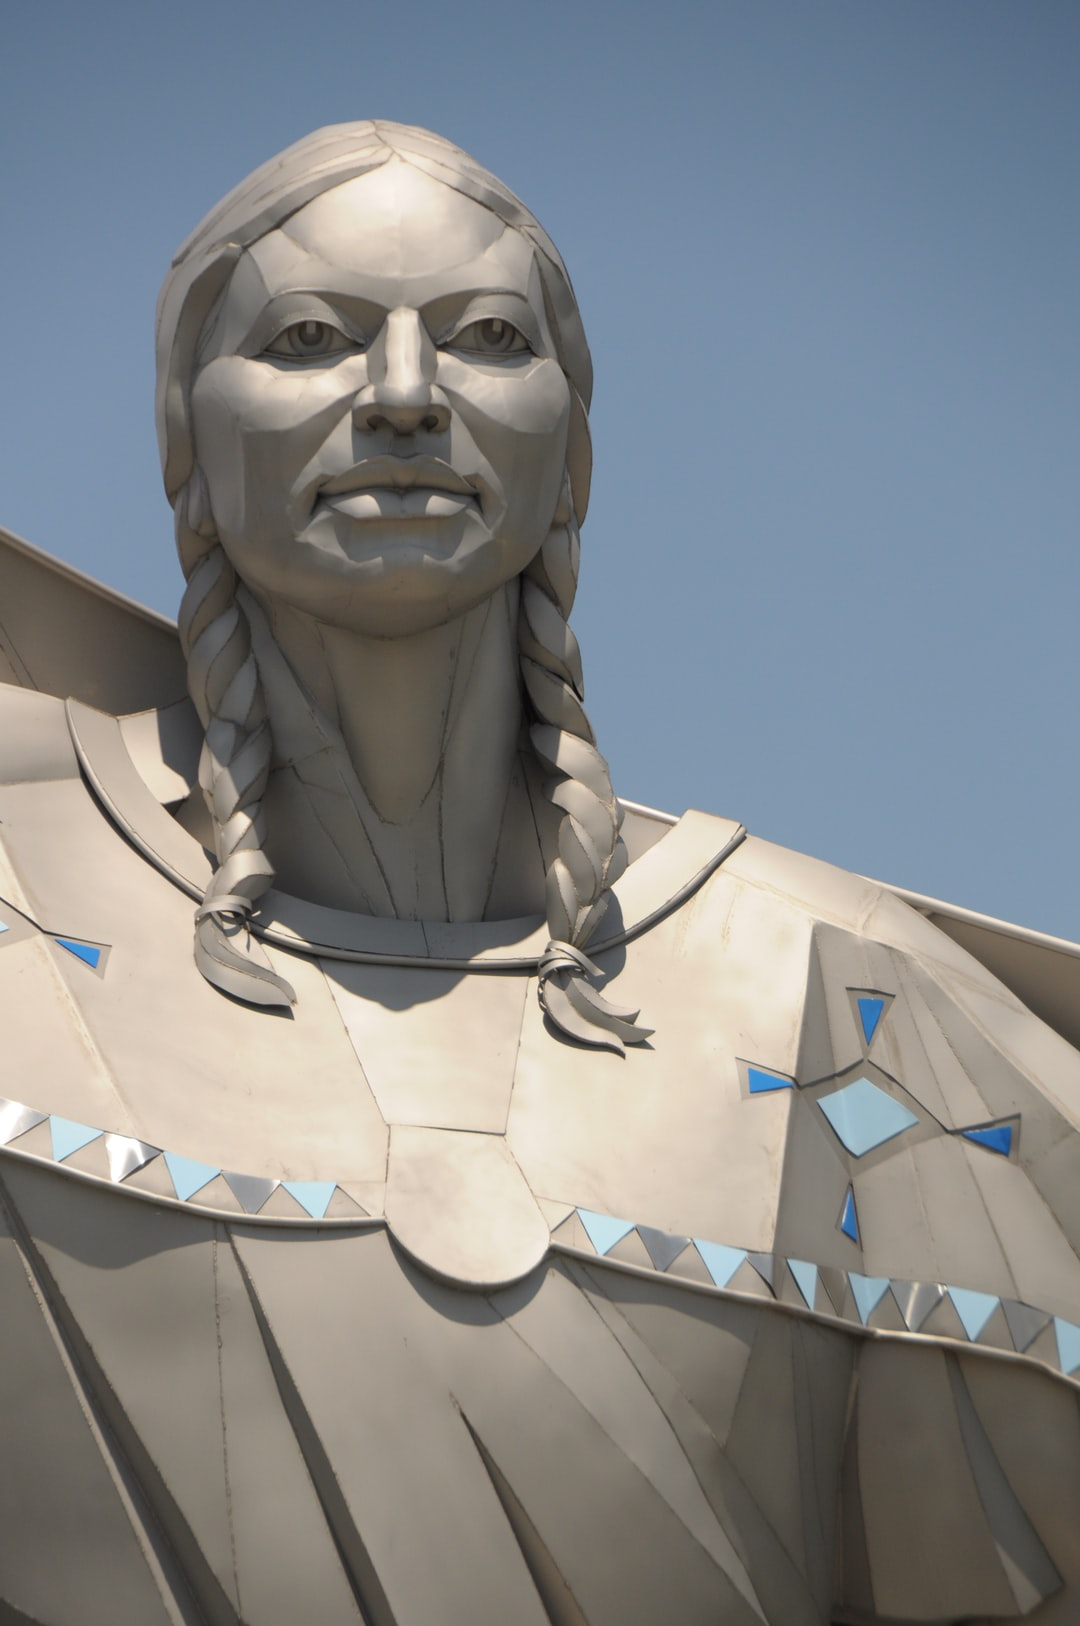 DIGNITY statue closeup Native American Indian Sioux woman star quilt sculpture Dale Lamphere sunset South Dakota Missouri River overlook